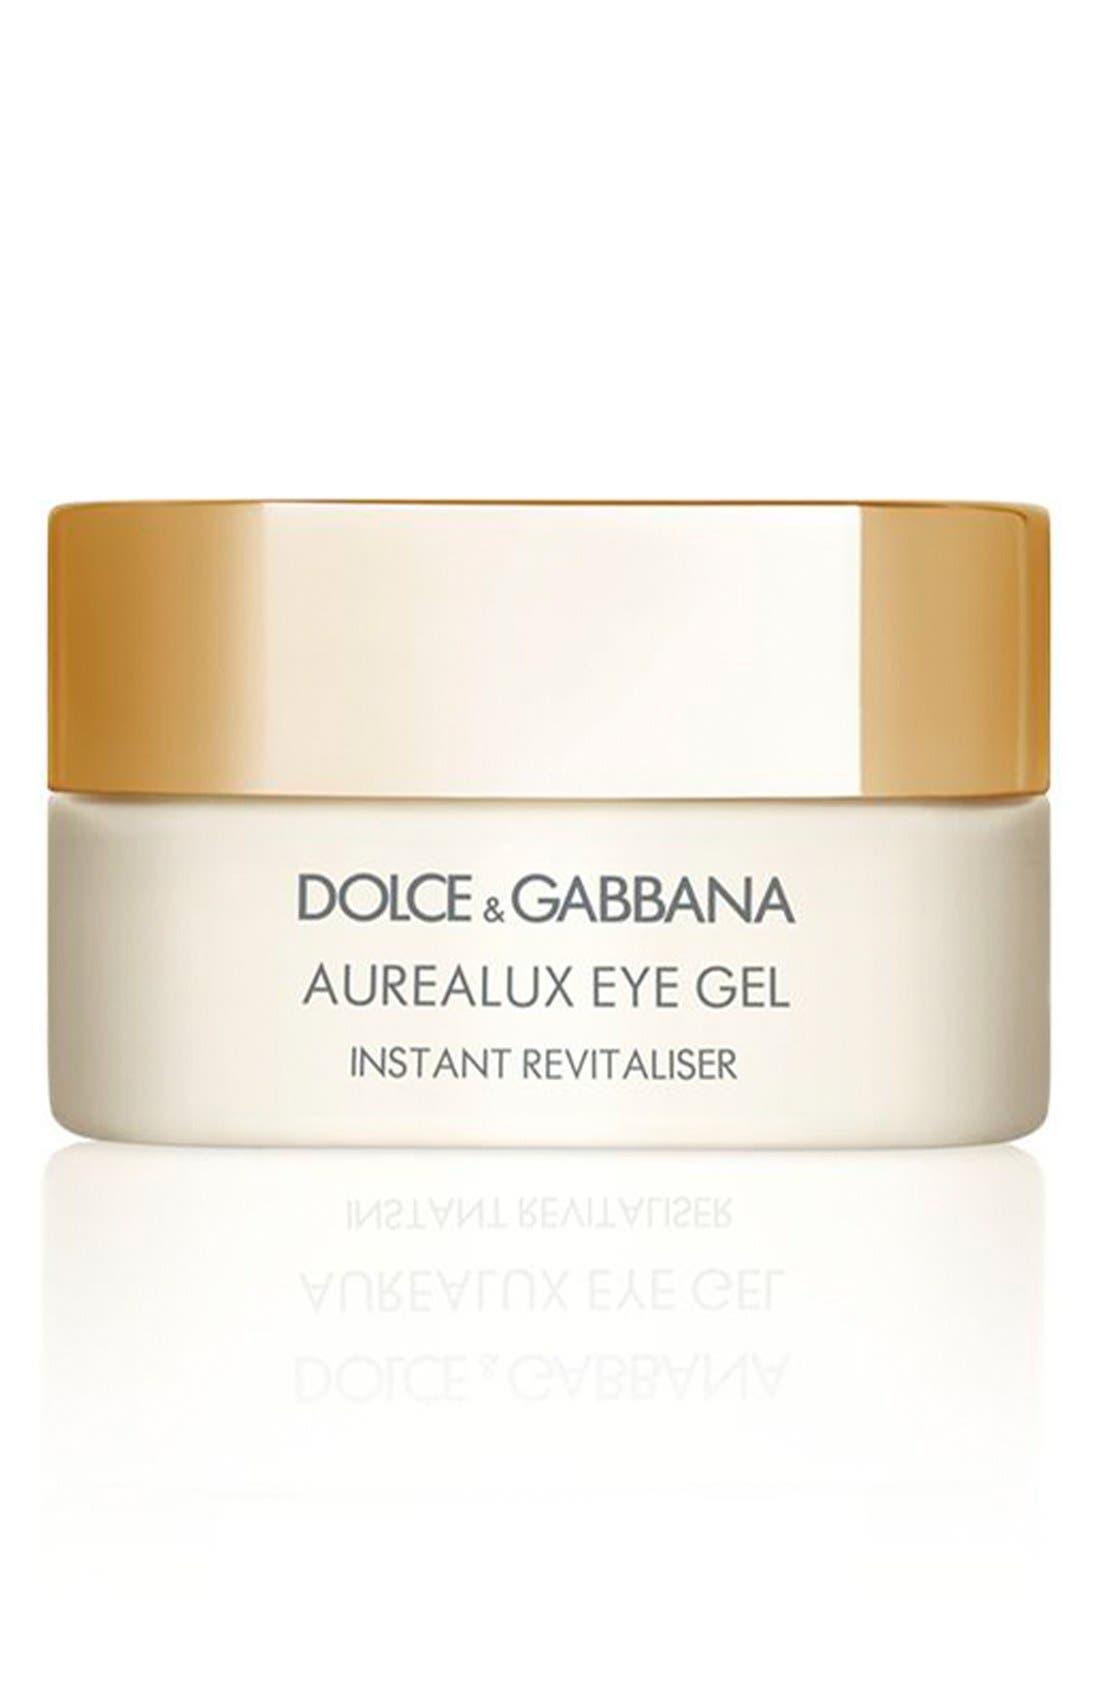 Dolce&Gabbana Beauty 'Aurealux' Eye Gel Instant Revitaliser